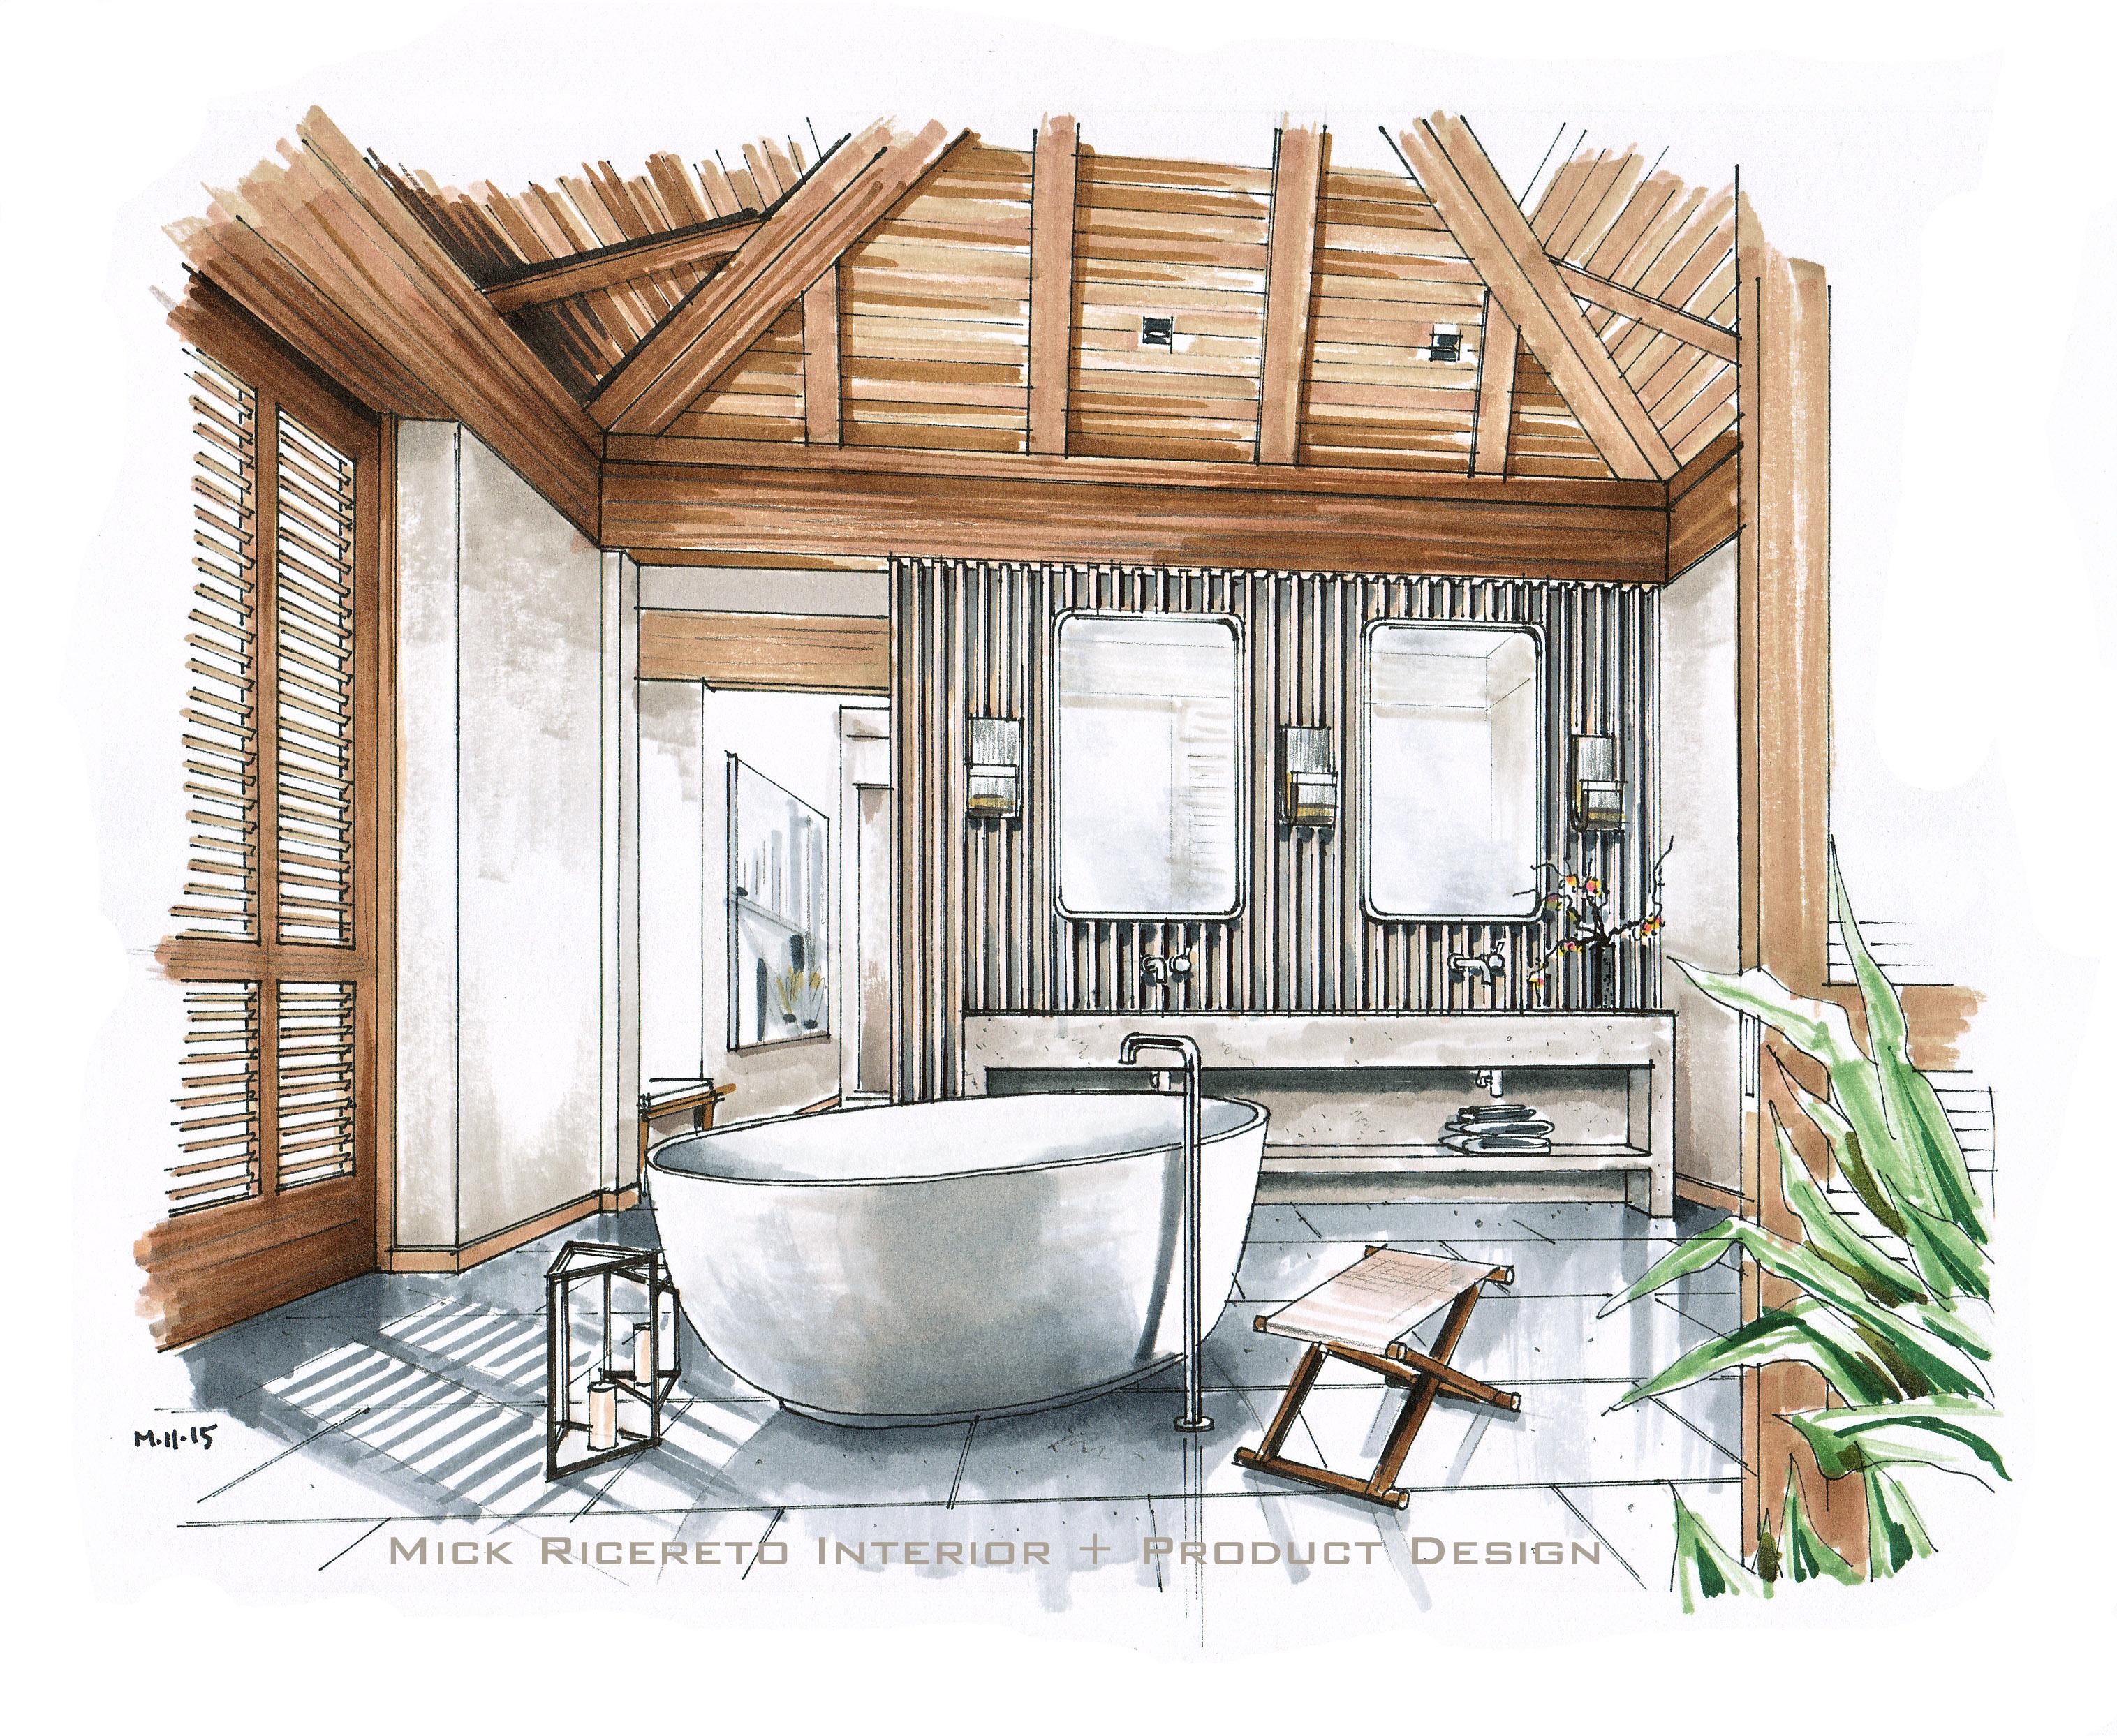 Architecture Mick Ricereto Interior Product Design